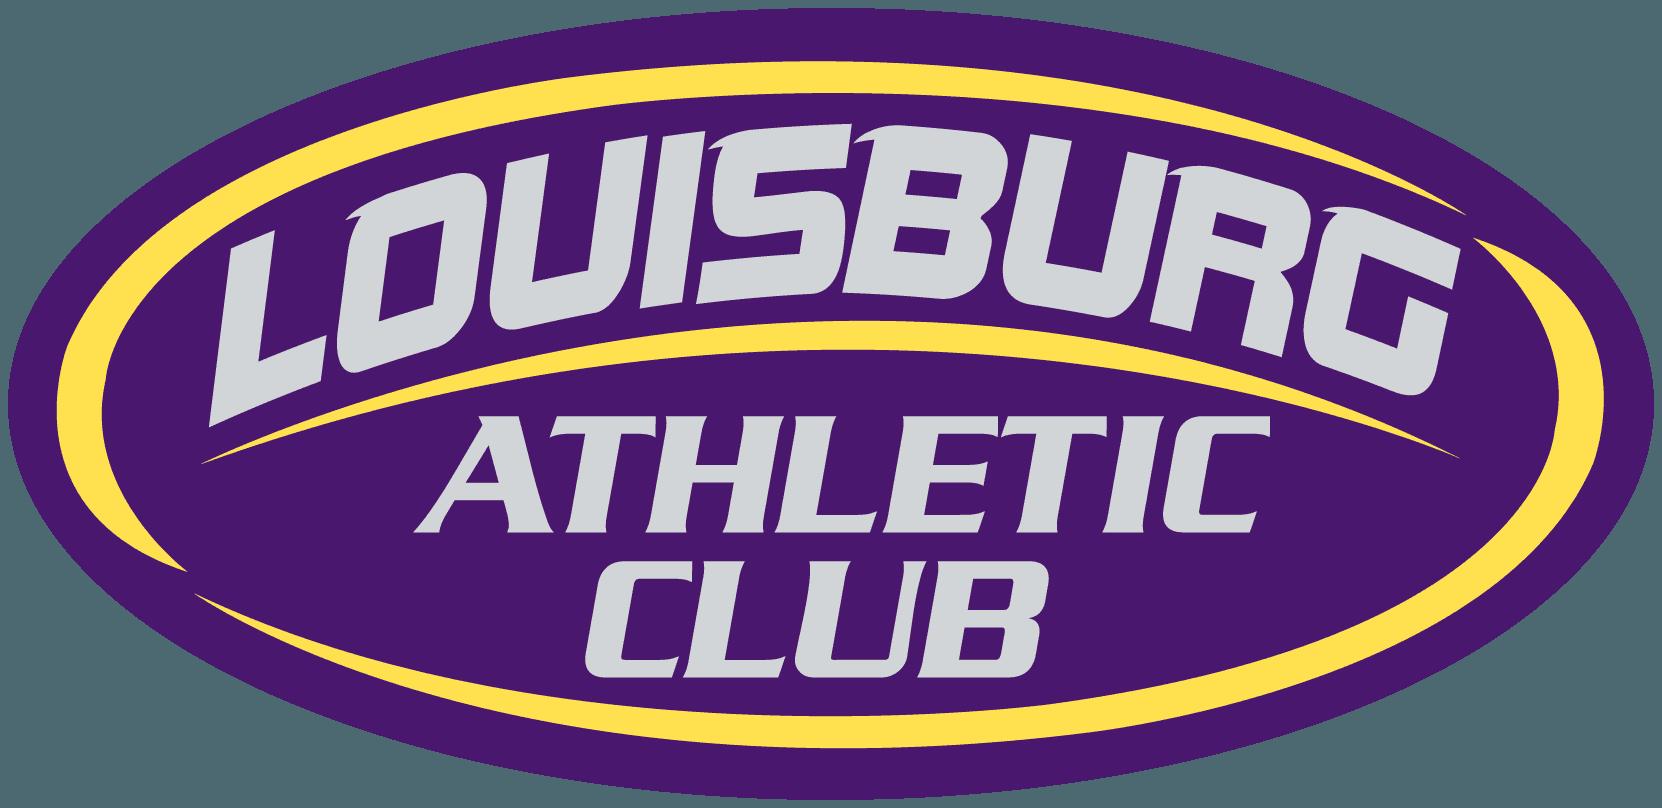 louisburg guys Louisburg college basketball data for recruiting and scholarship purposes.